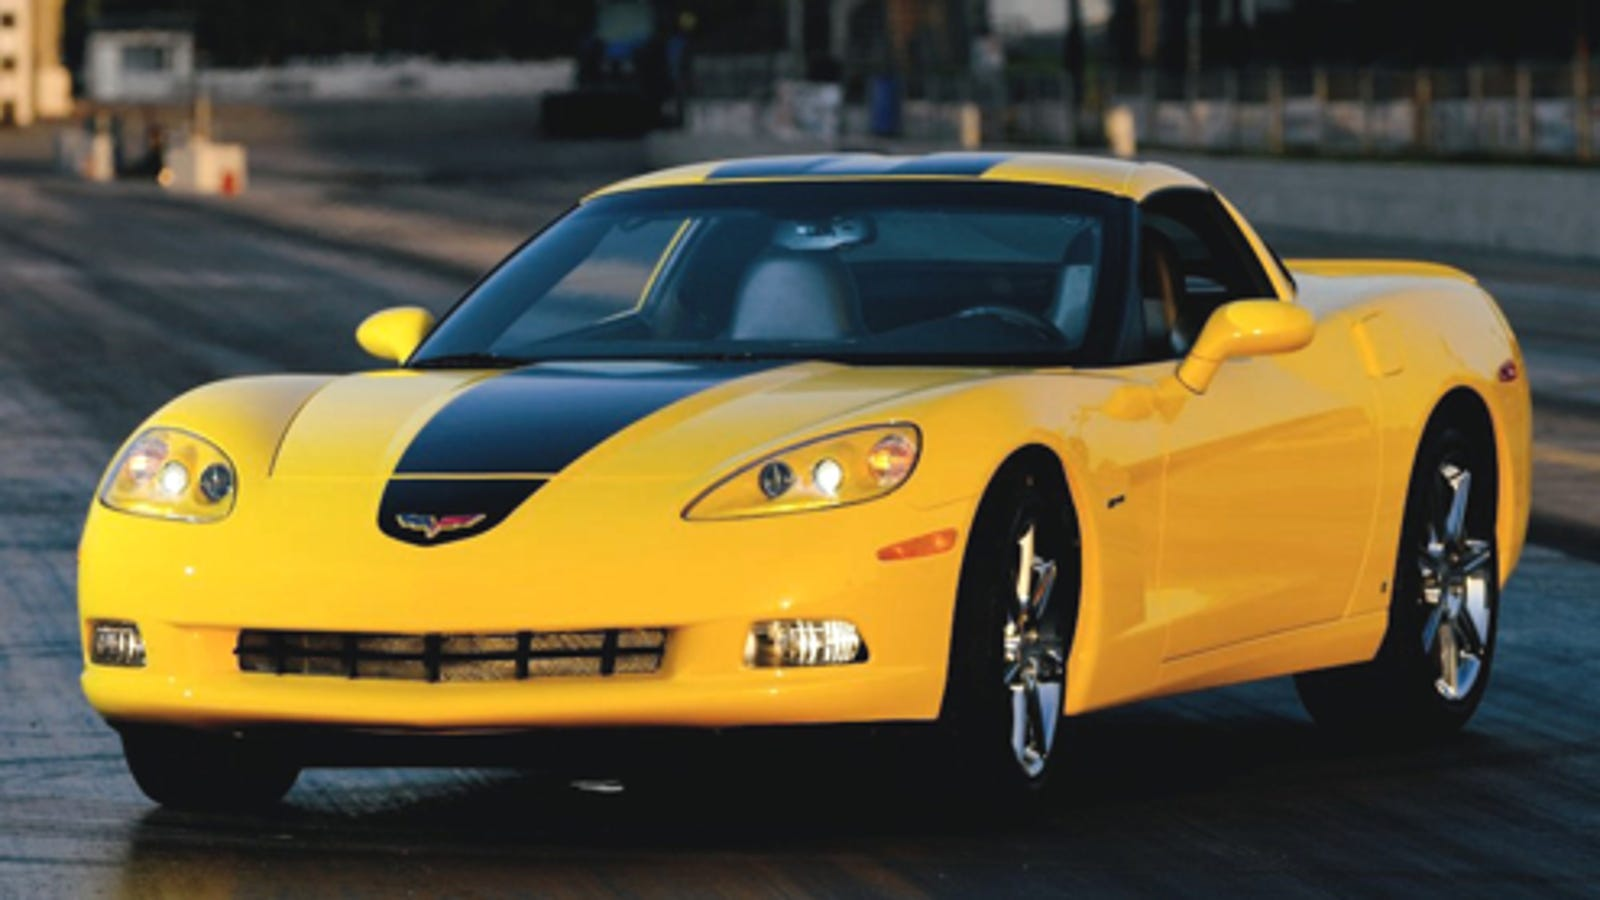 corvette zhz hertz adds a 39 vette to the rent a racer fleet. Black Bedroom Furniture Sets. Home Design Ideas